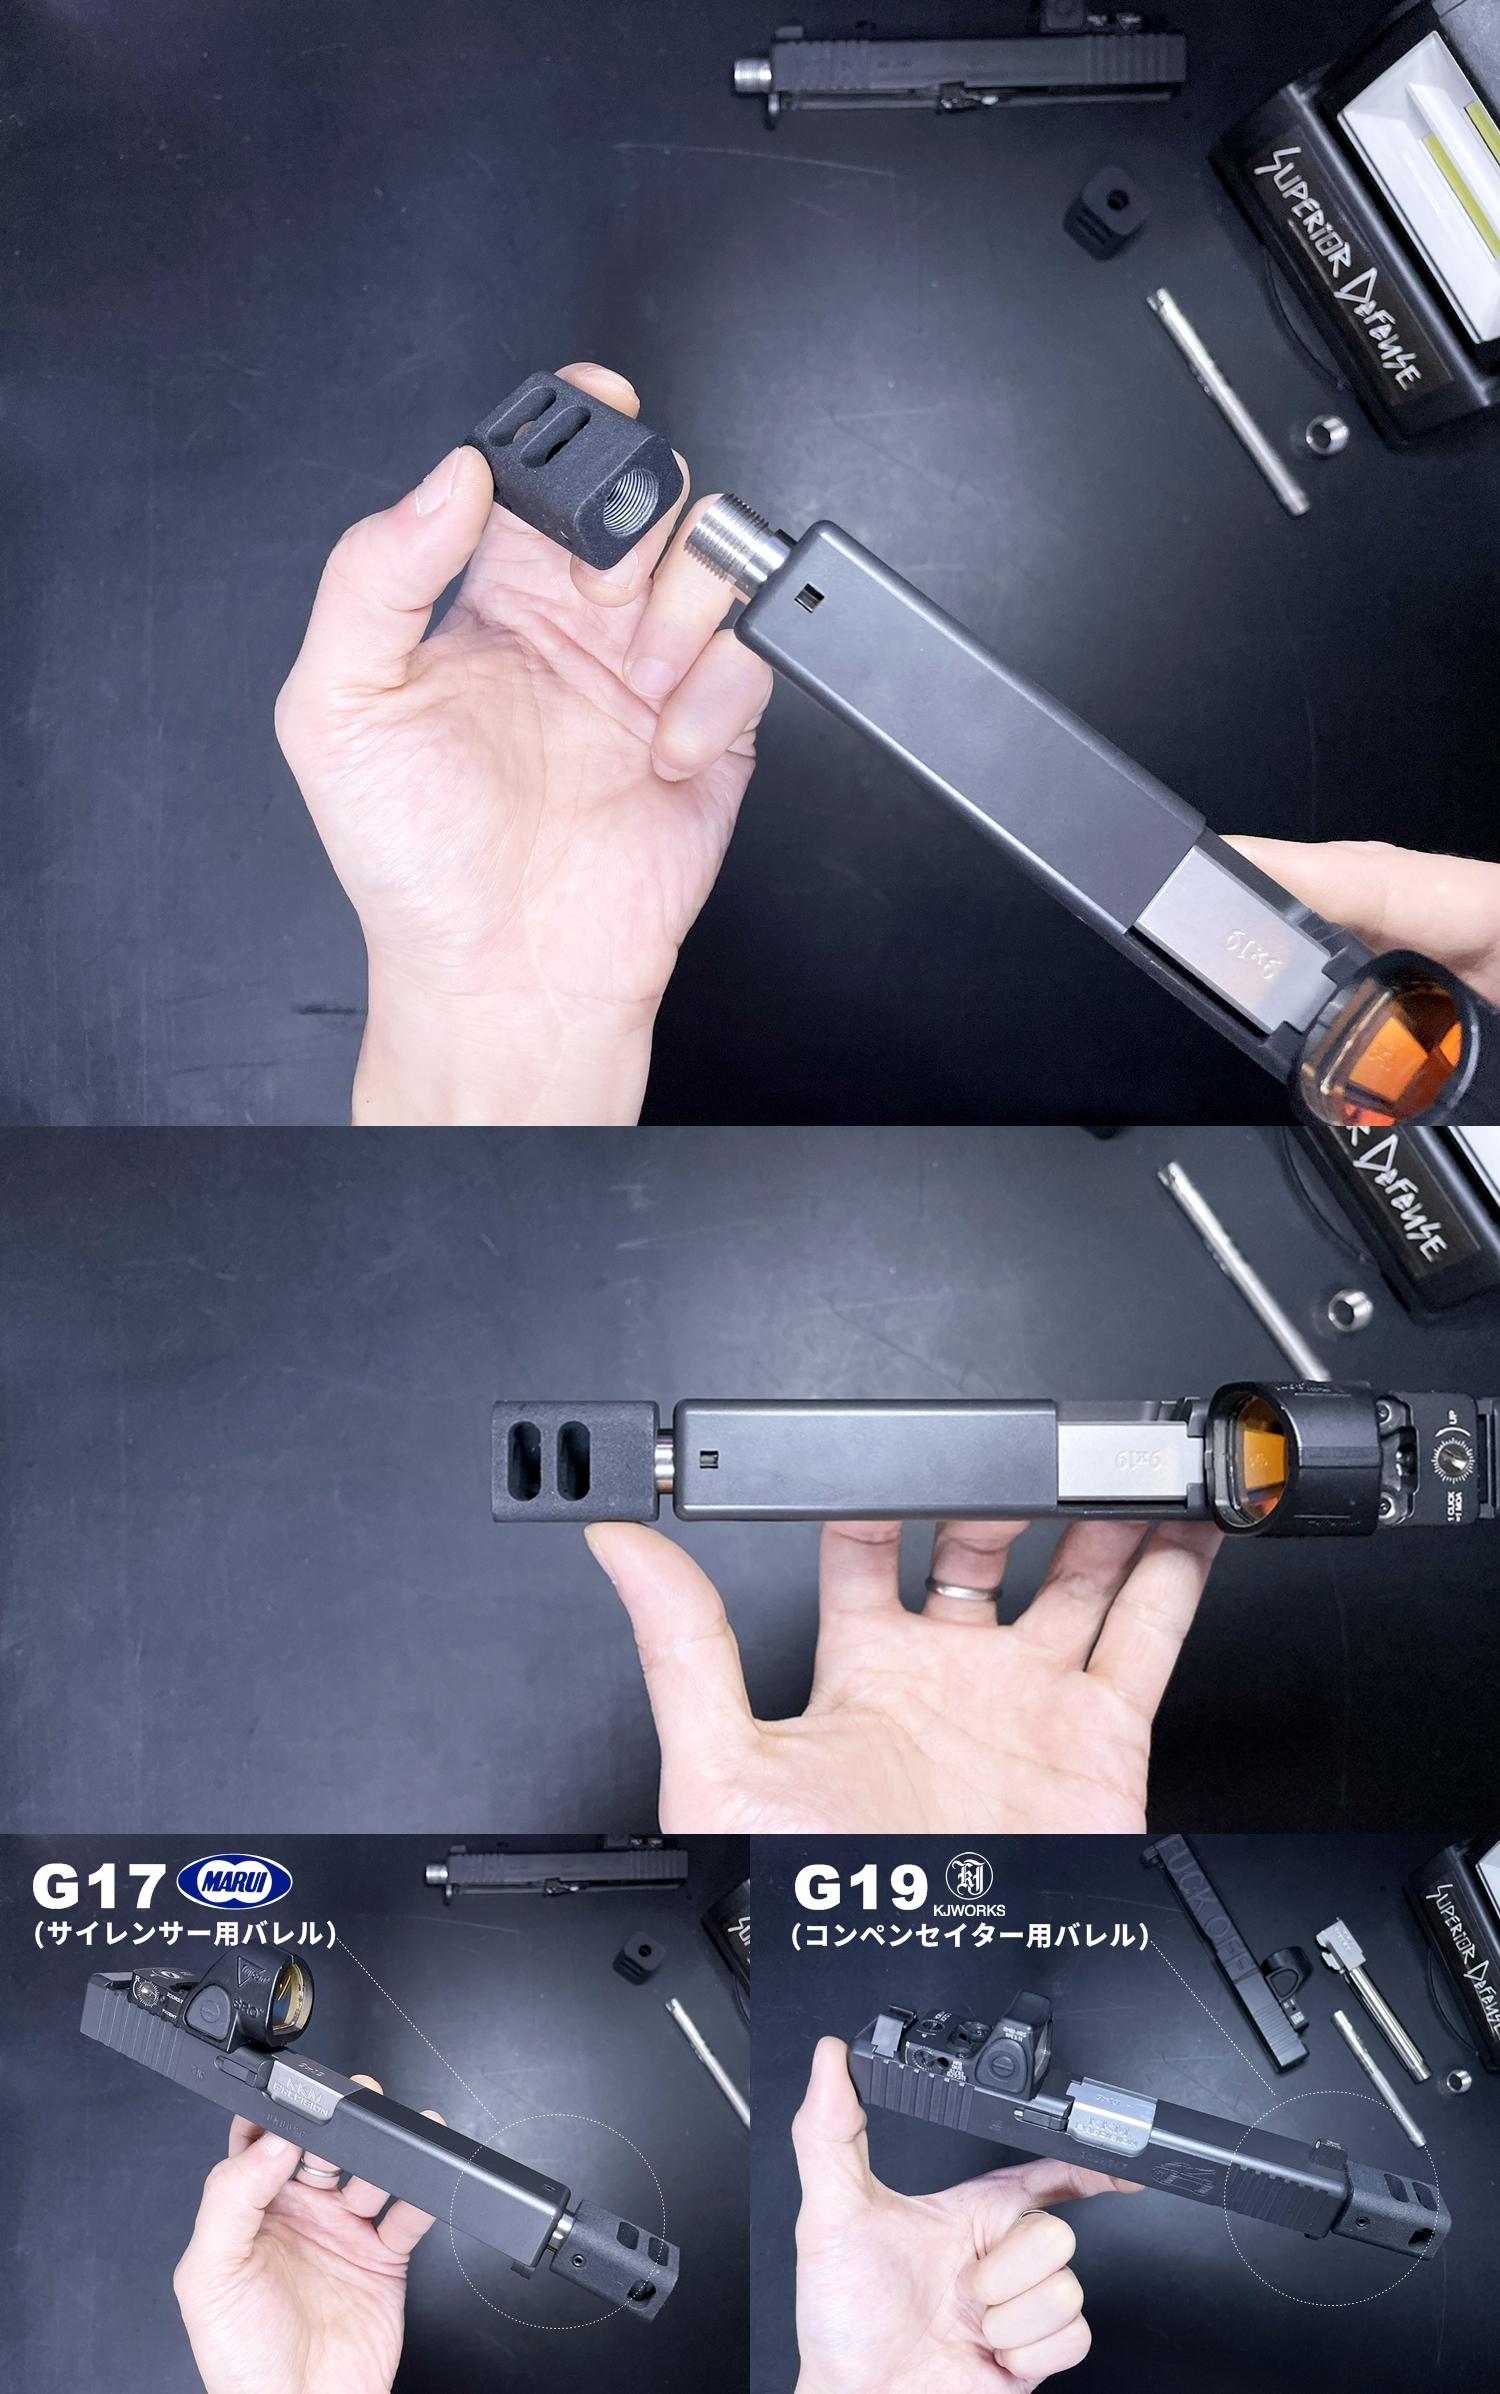 7 Guns Modify KKM PRECISION GLOCK ステンレスアウターバレル 東京マルイ G17 G18C GBB GET! リアルで重量感あるCNC 精密切り出し加工! BARREL+PROTECTOR+ショートリコイルアシストスプリング+インナーバレルセット